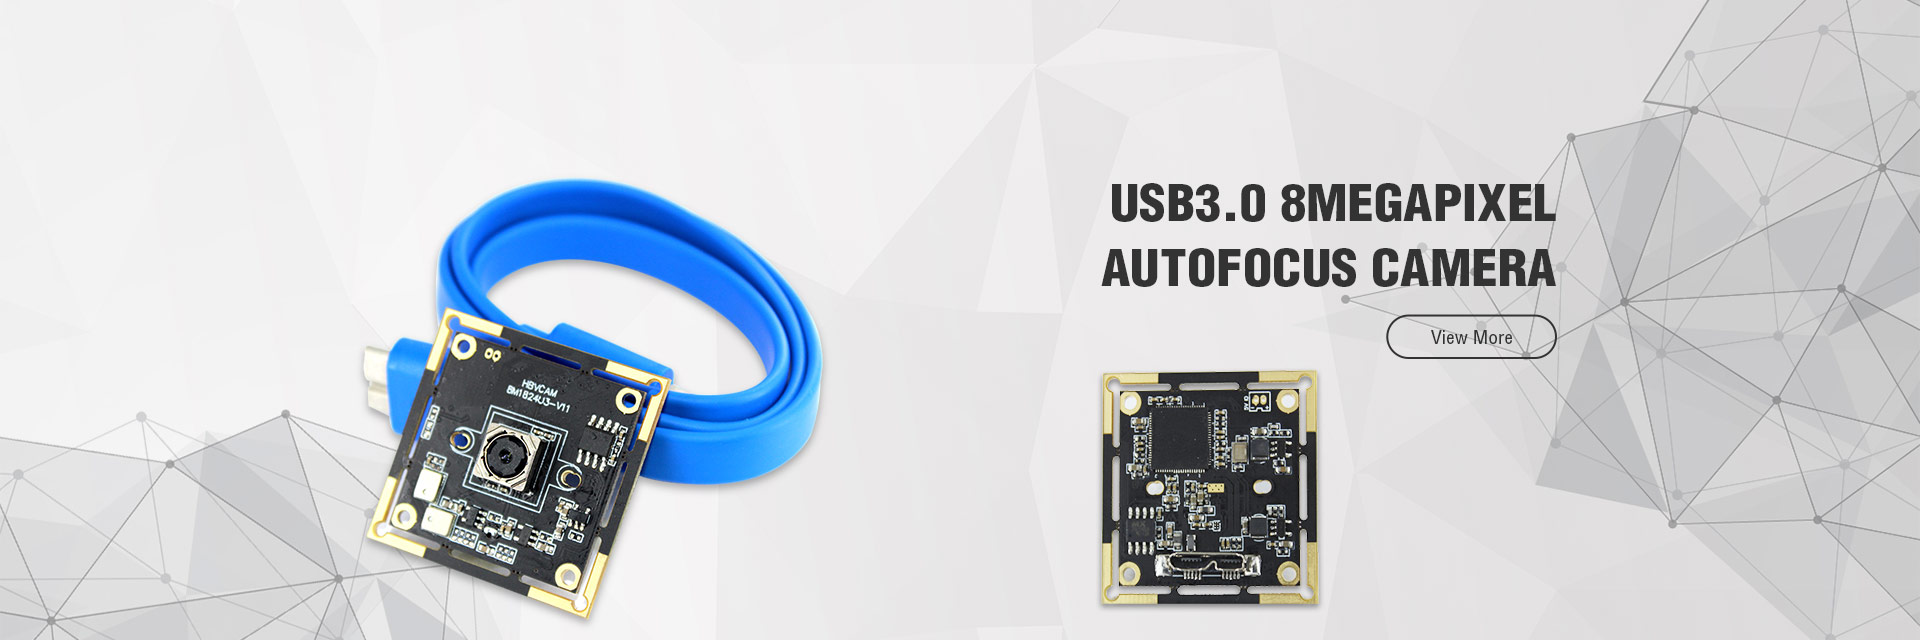 USB3.0 8MEGAPIXEL AUTOFOCUS CAMERA